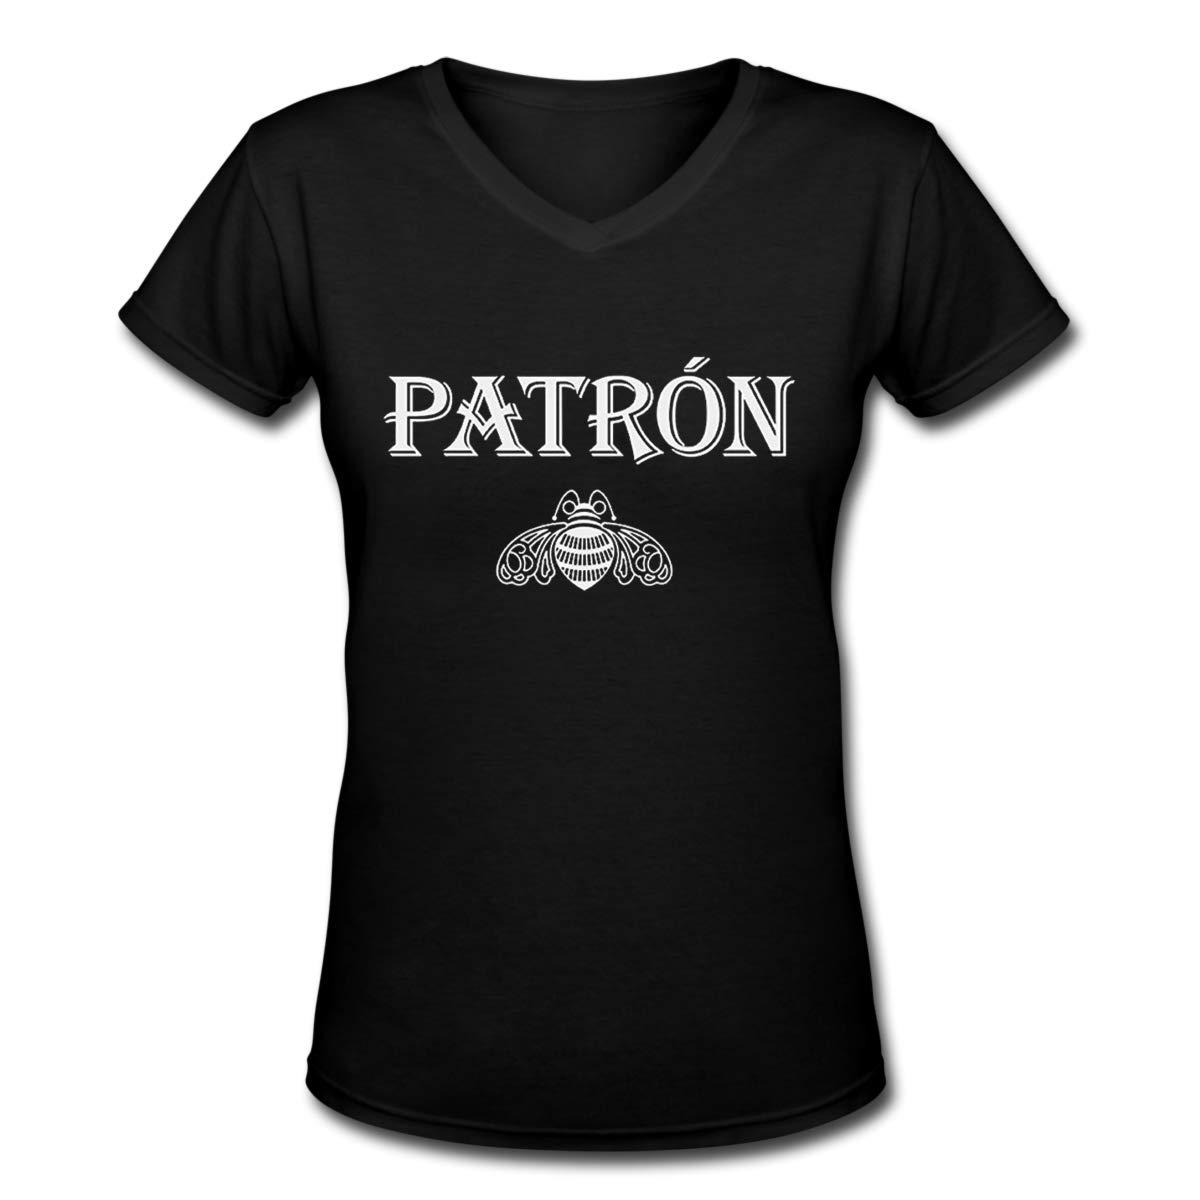 Jadespon Leisure Patron Tequila Logo Funny Tshirt For